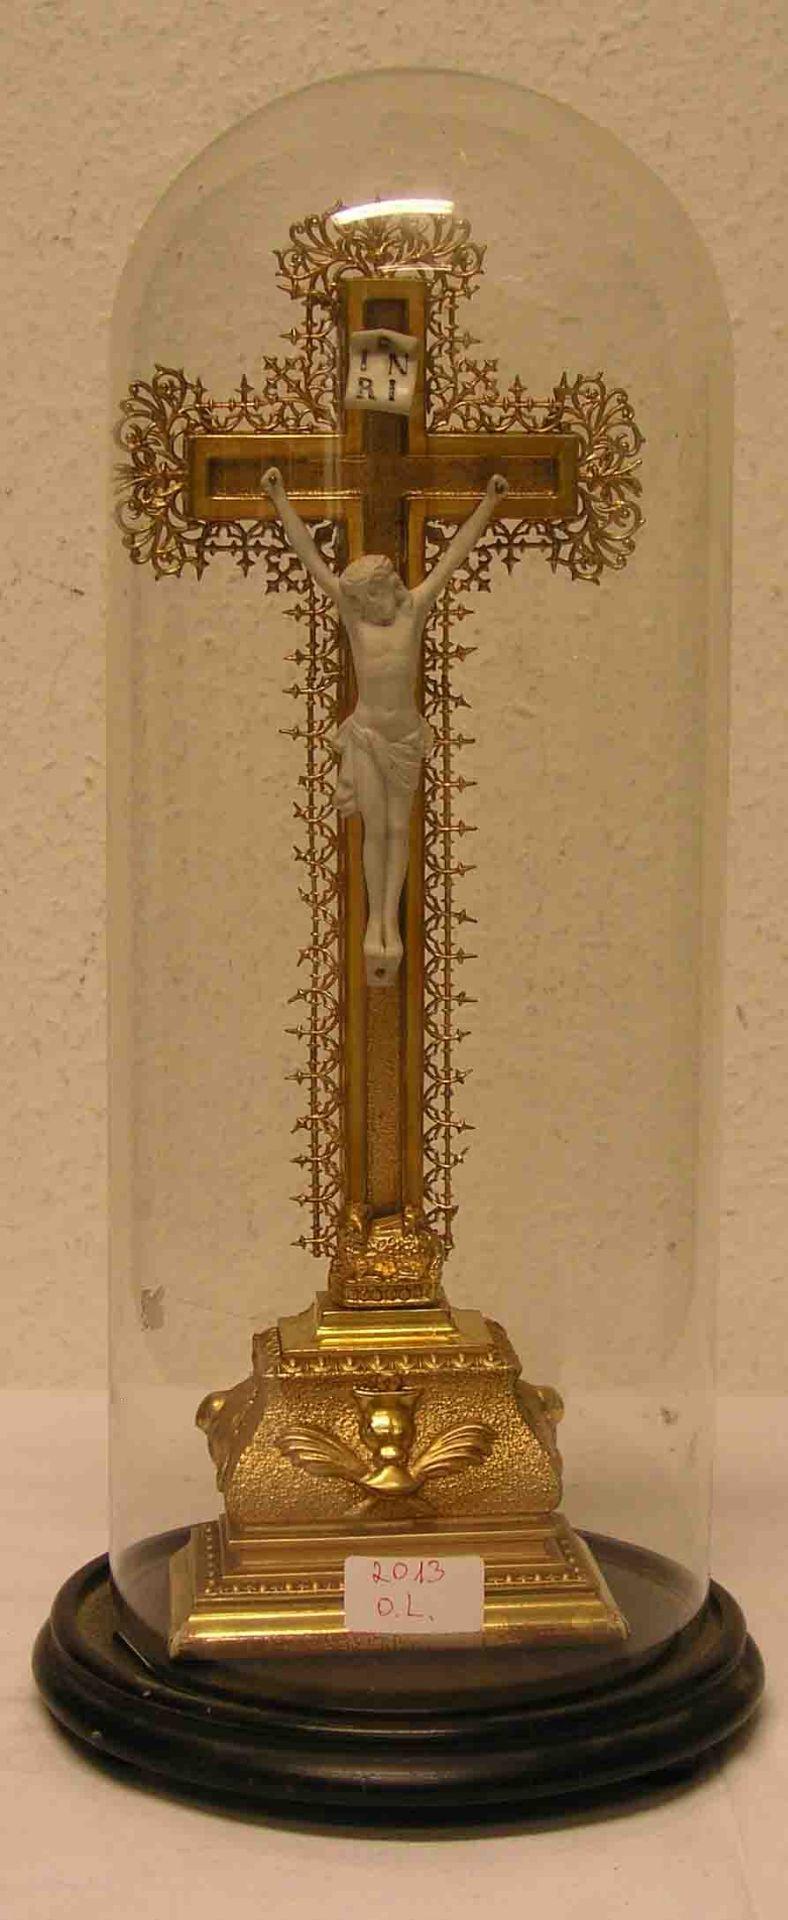 Standkruzifix. 19. Jh. Christuskorpus